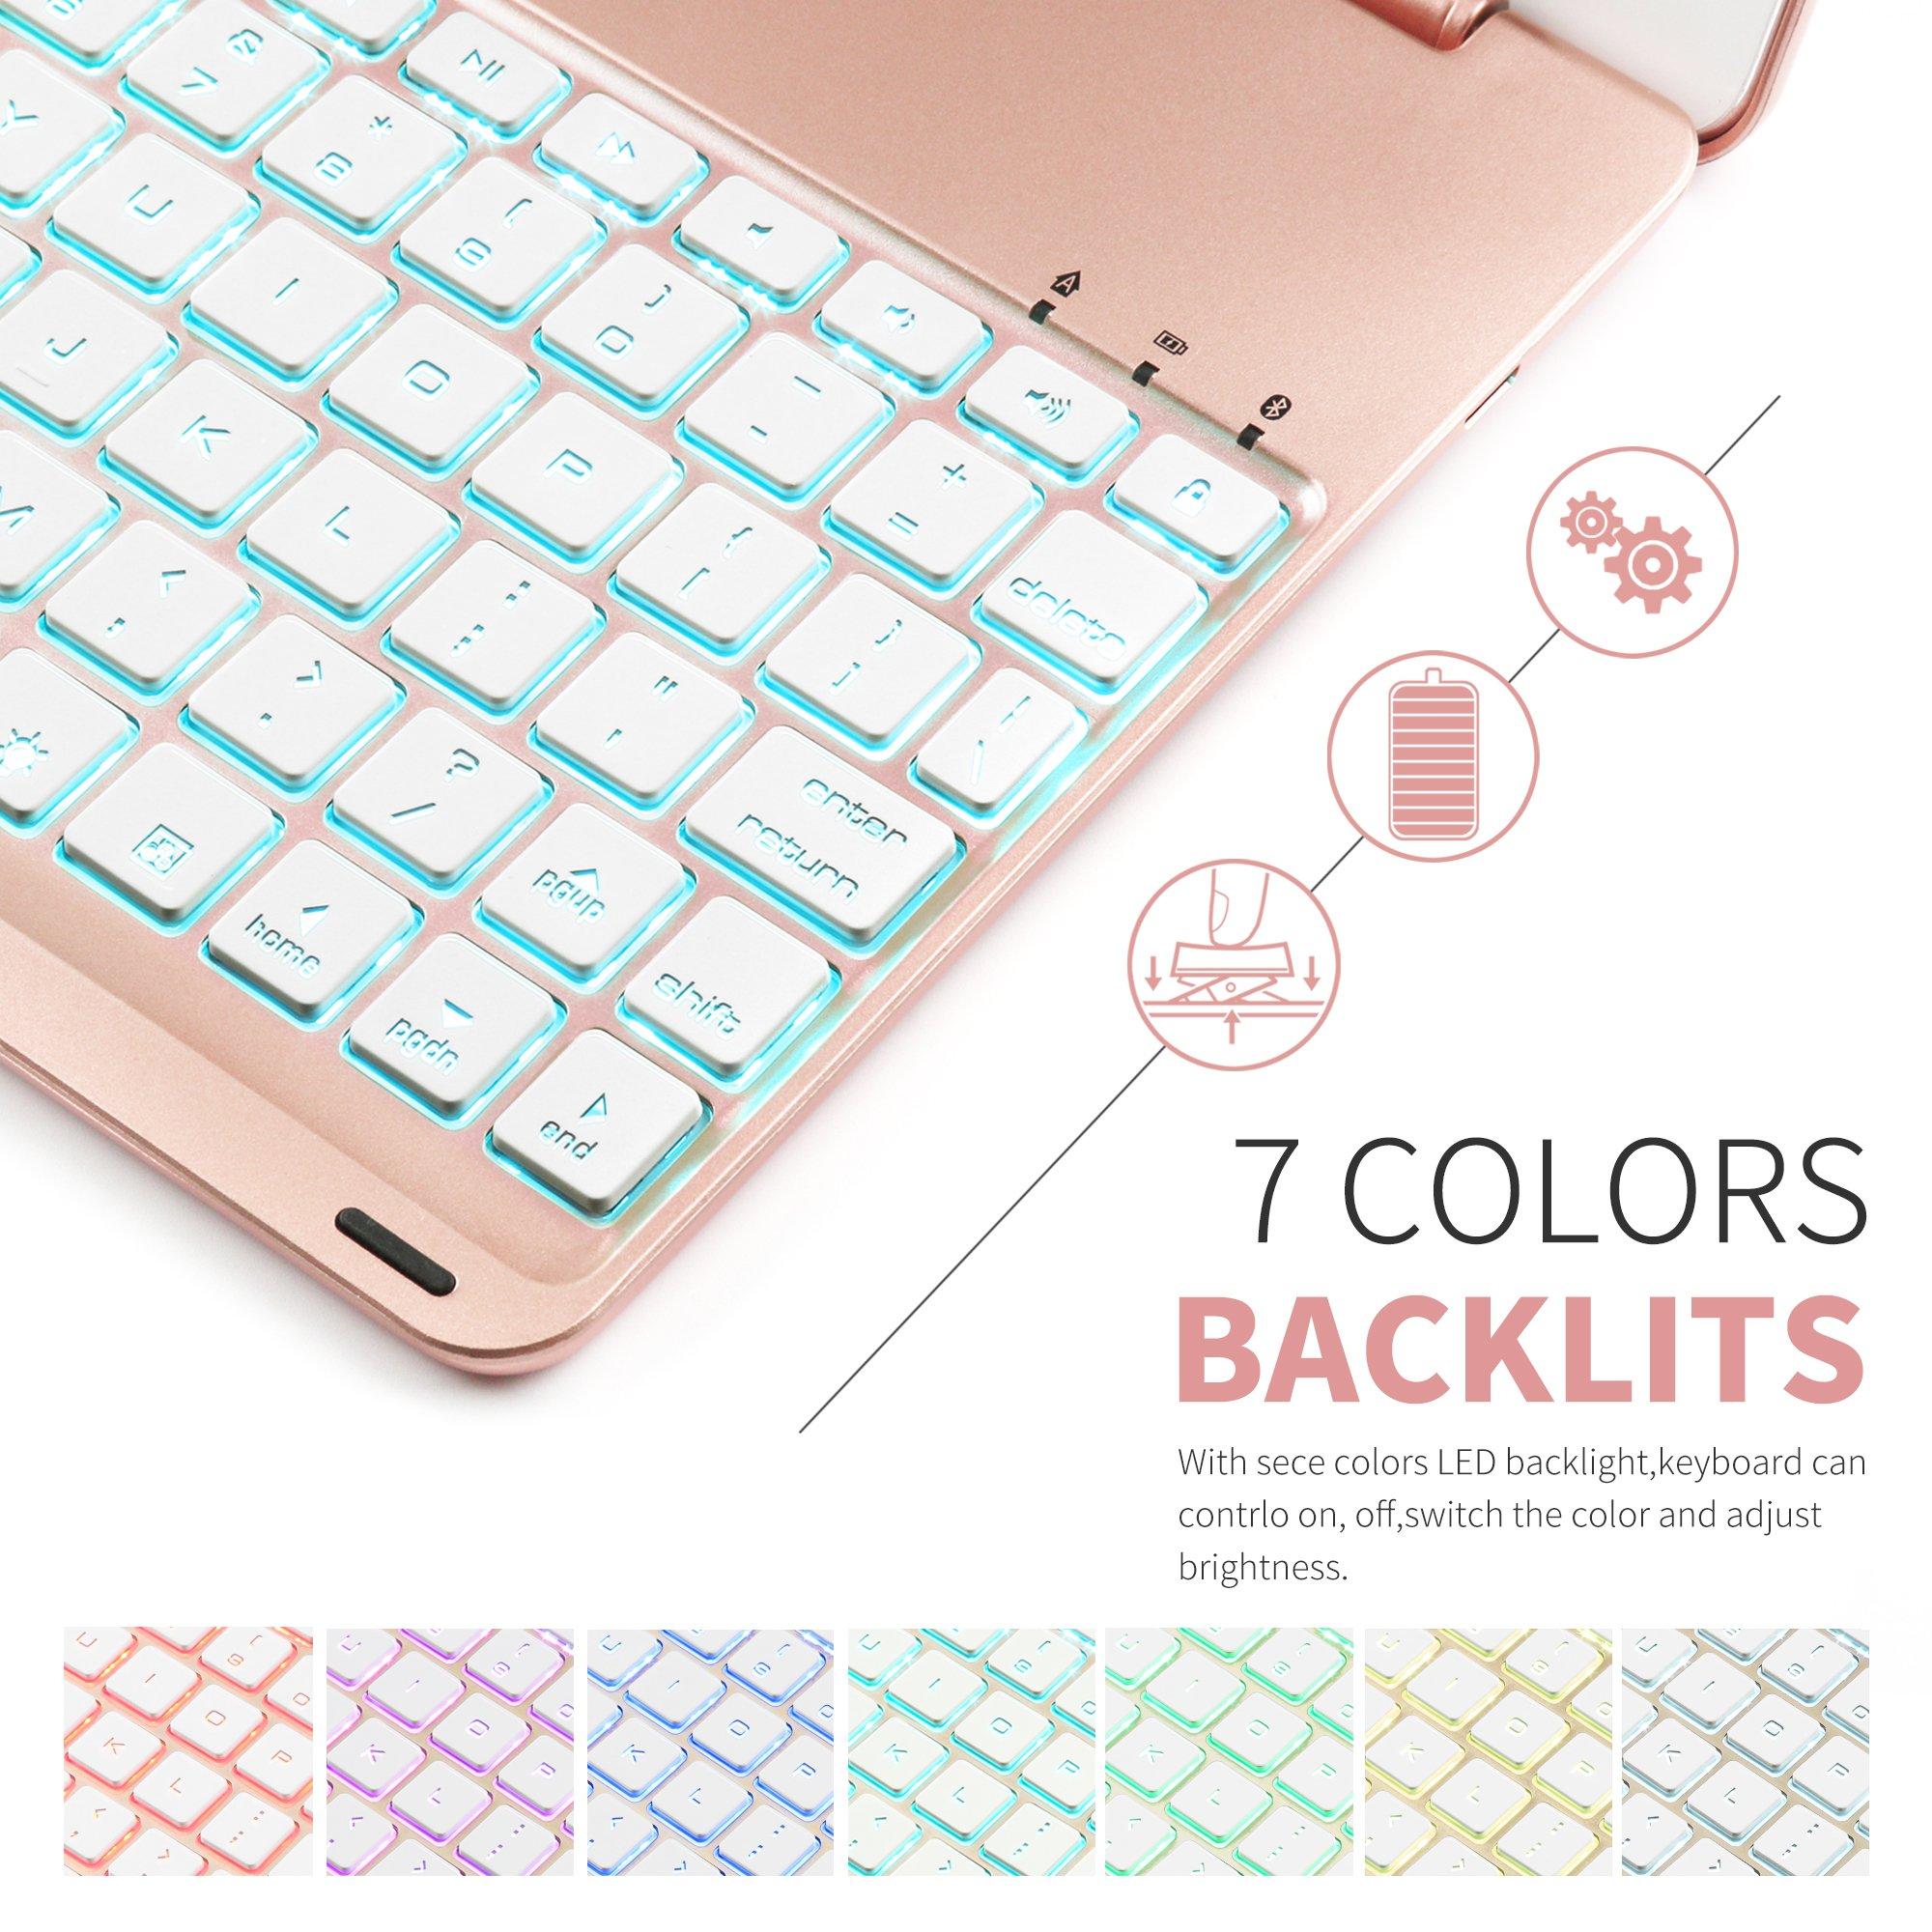 Keyboard Case iPad 9.7 2018(6th Gen) - iPad 9.7 2017(5th Gen) - iPad Air 1-130 Rotating - 7 Color Backlit Keyboard -Thin & Light - iPad Case with Keyboard, (Rose gold, 9,7)